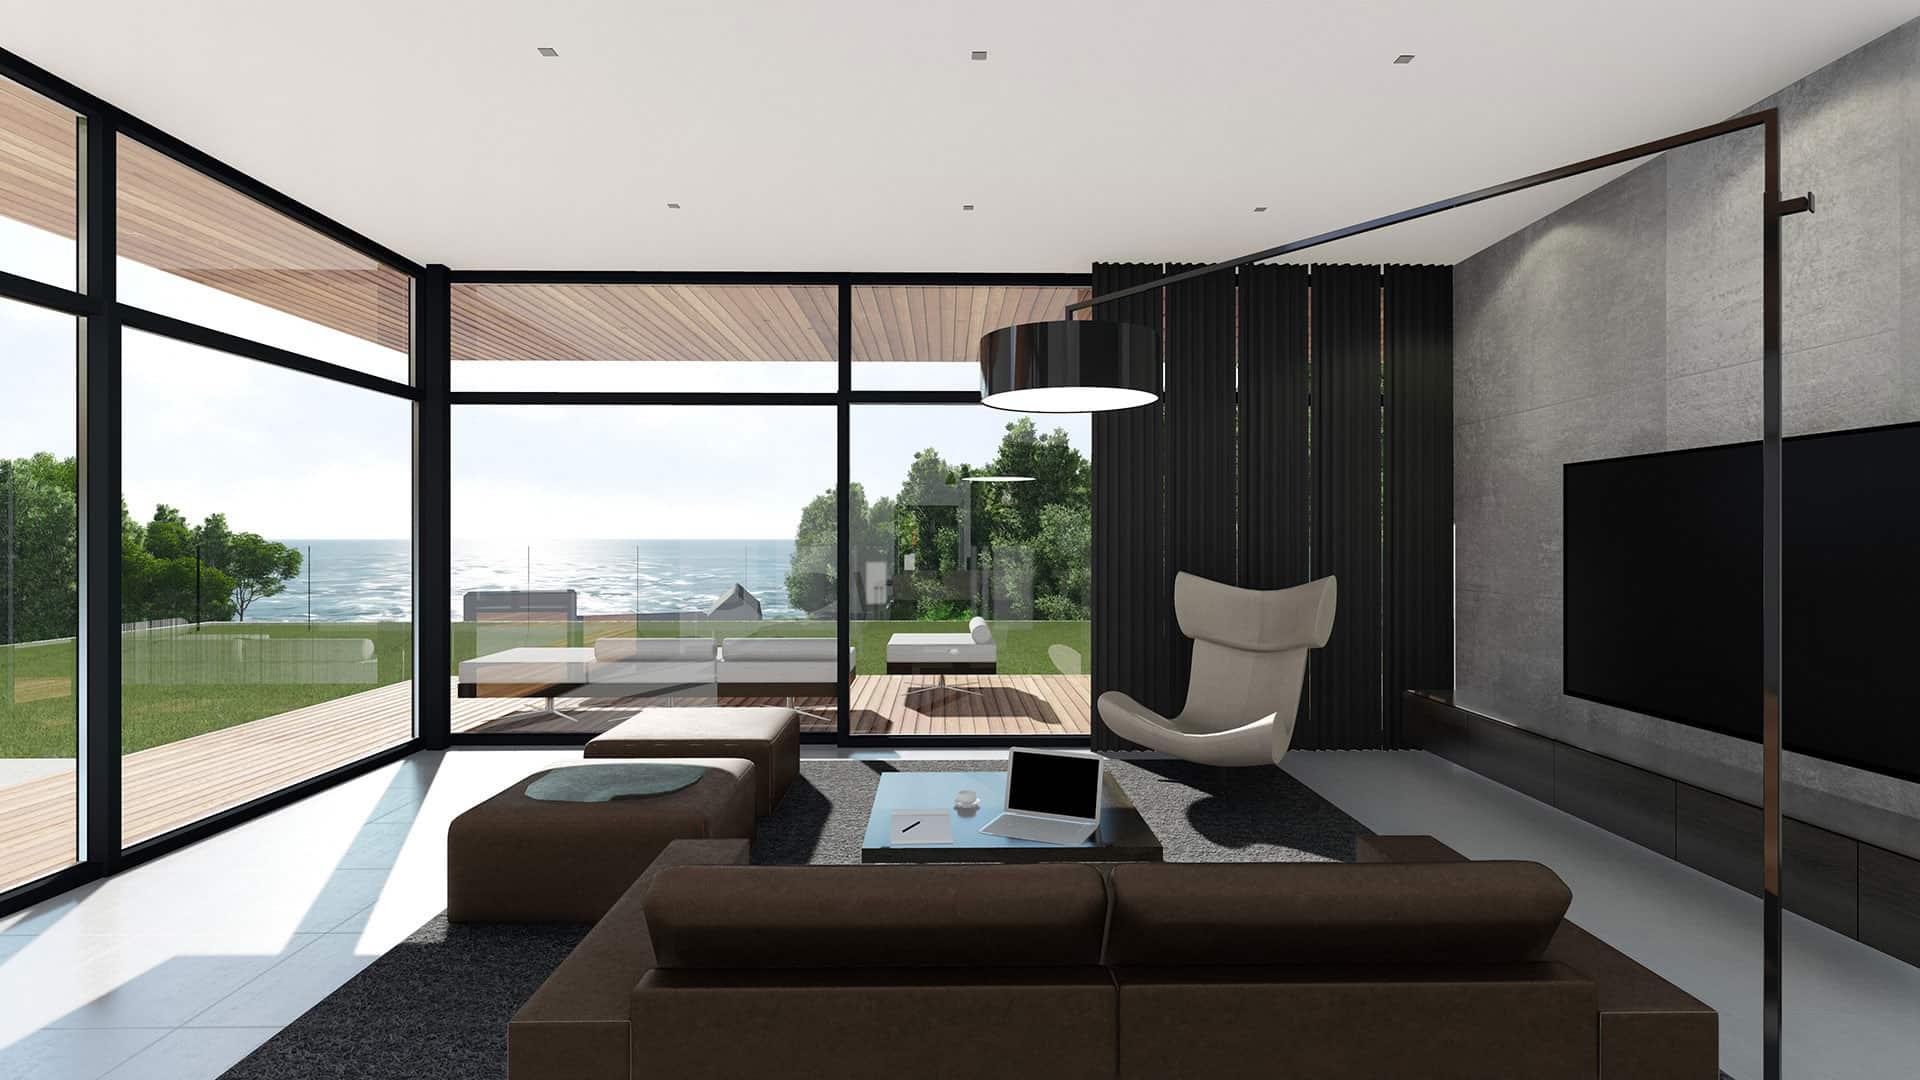 Blakc curtains far huge ceiling-high windows with black frame